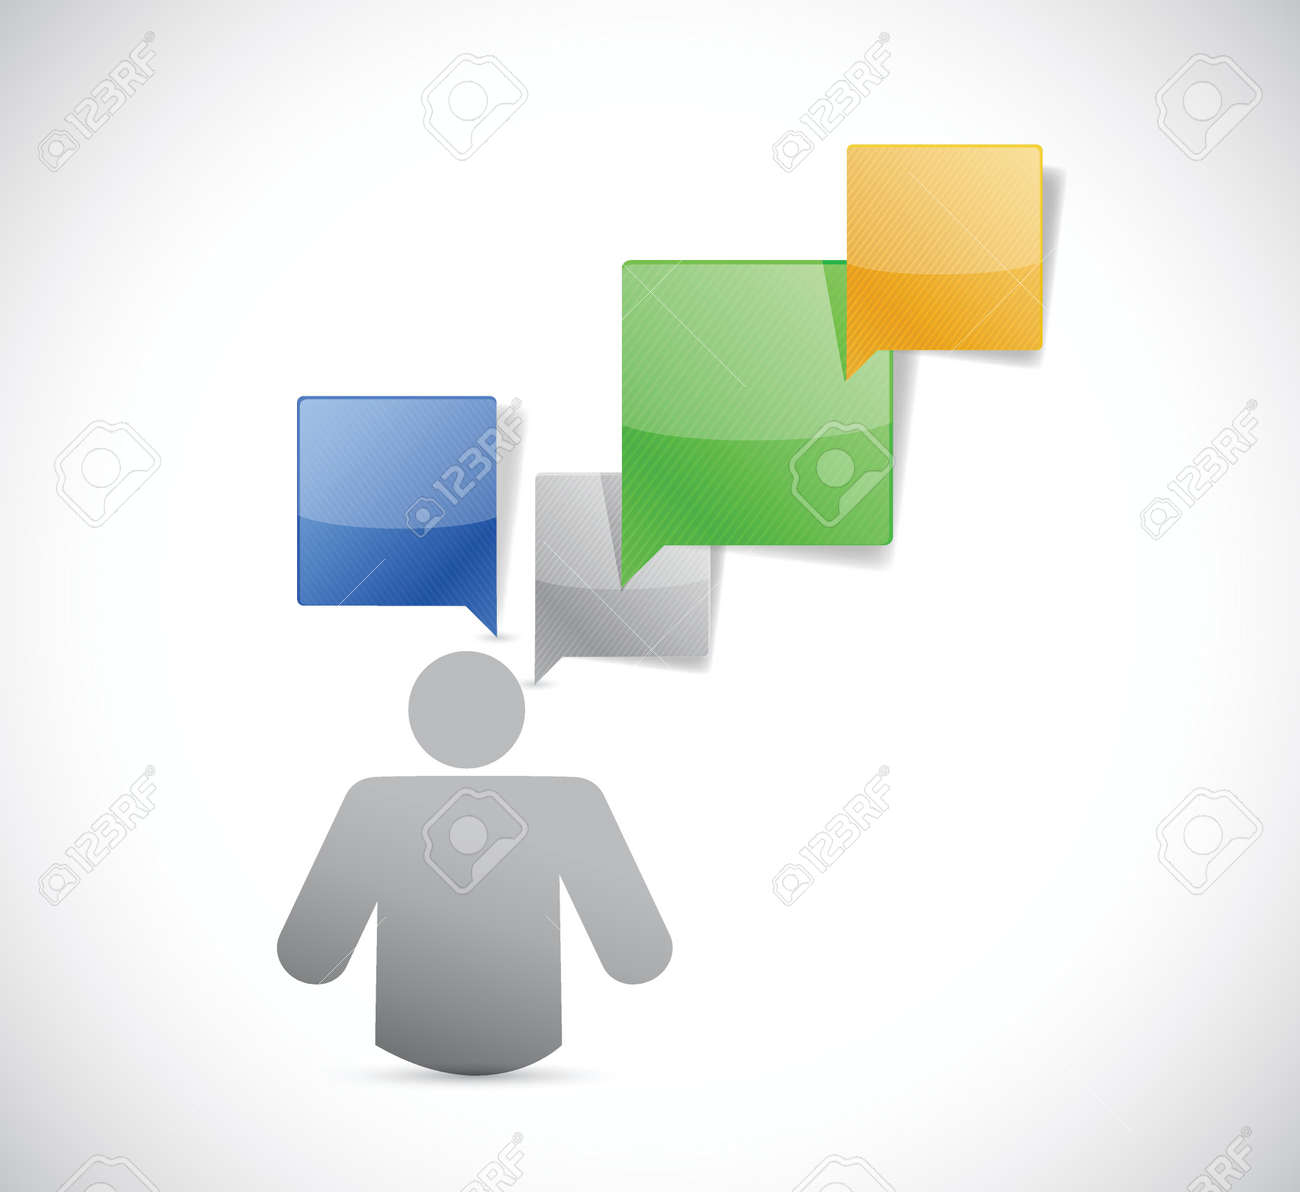 icon avatar communication illustration design over white Stock Vector - 22444816